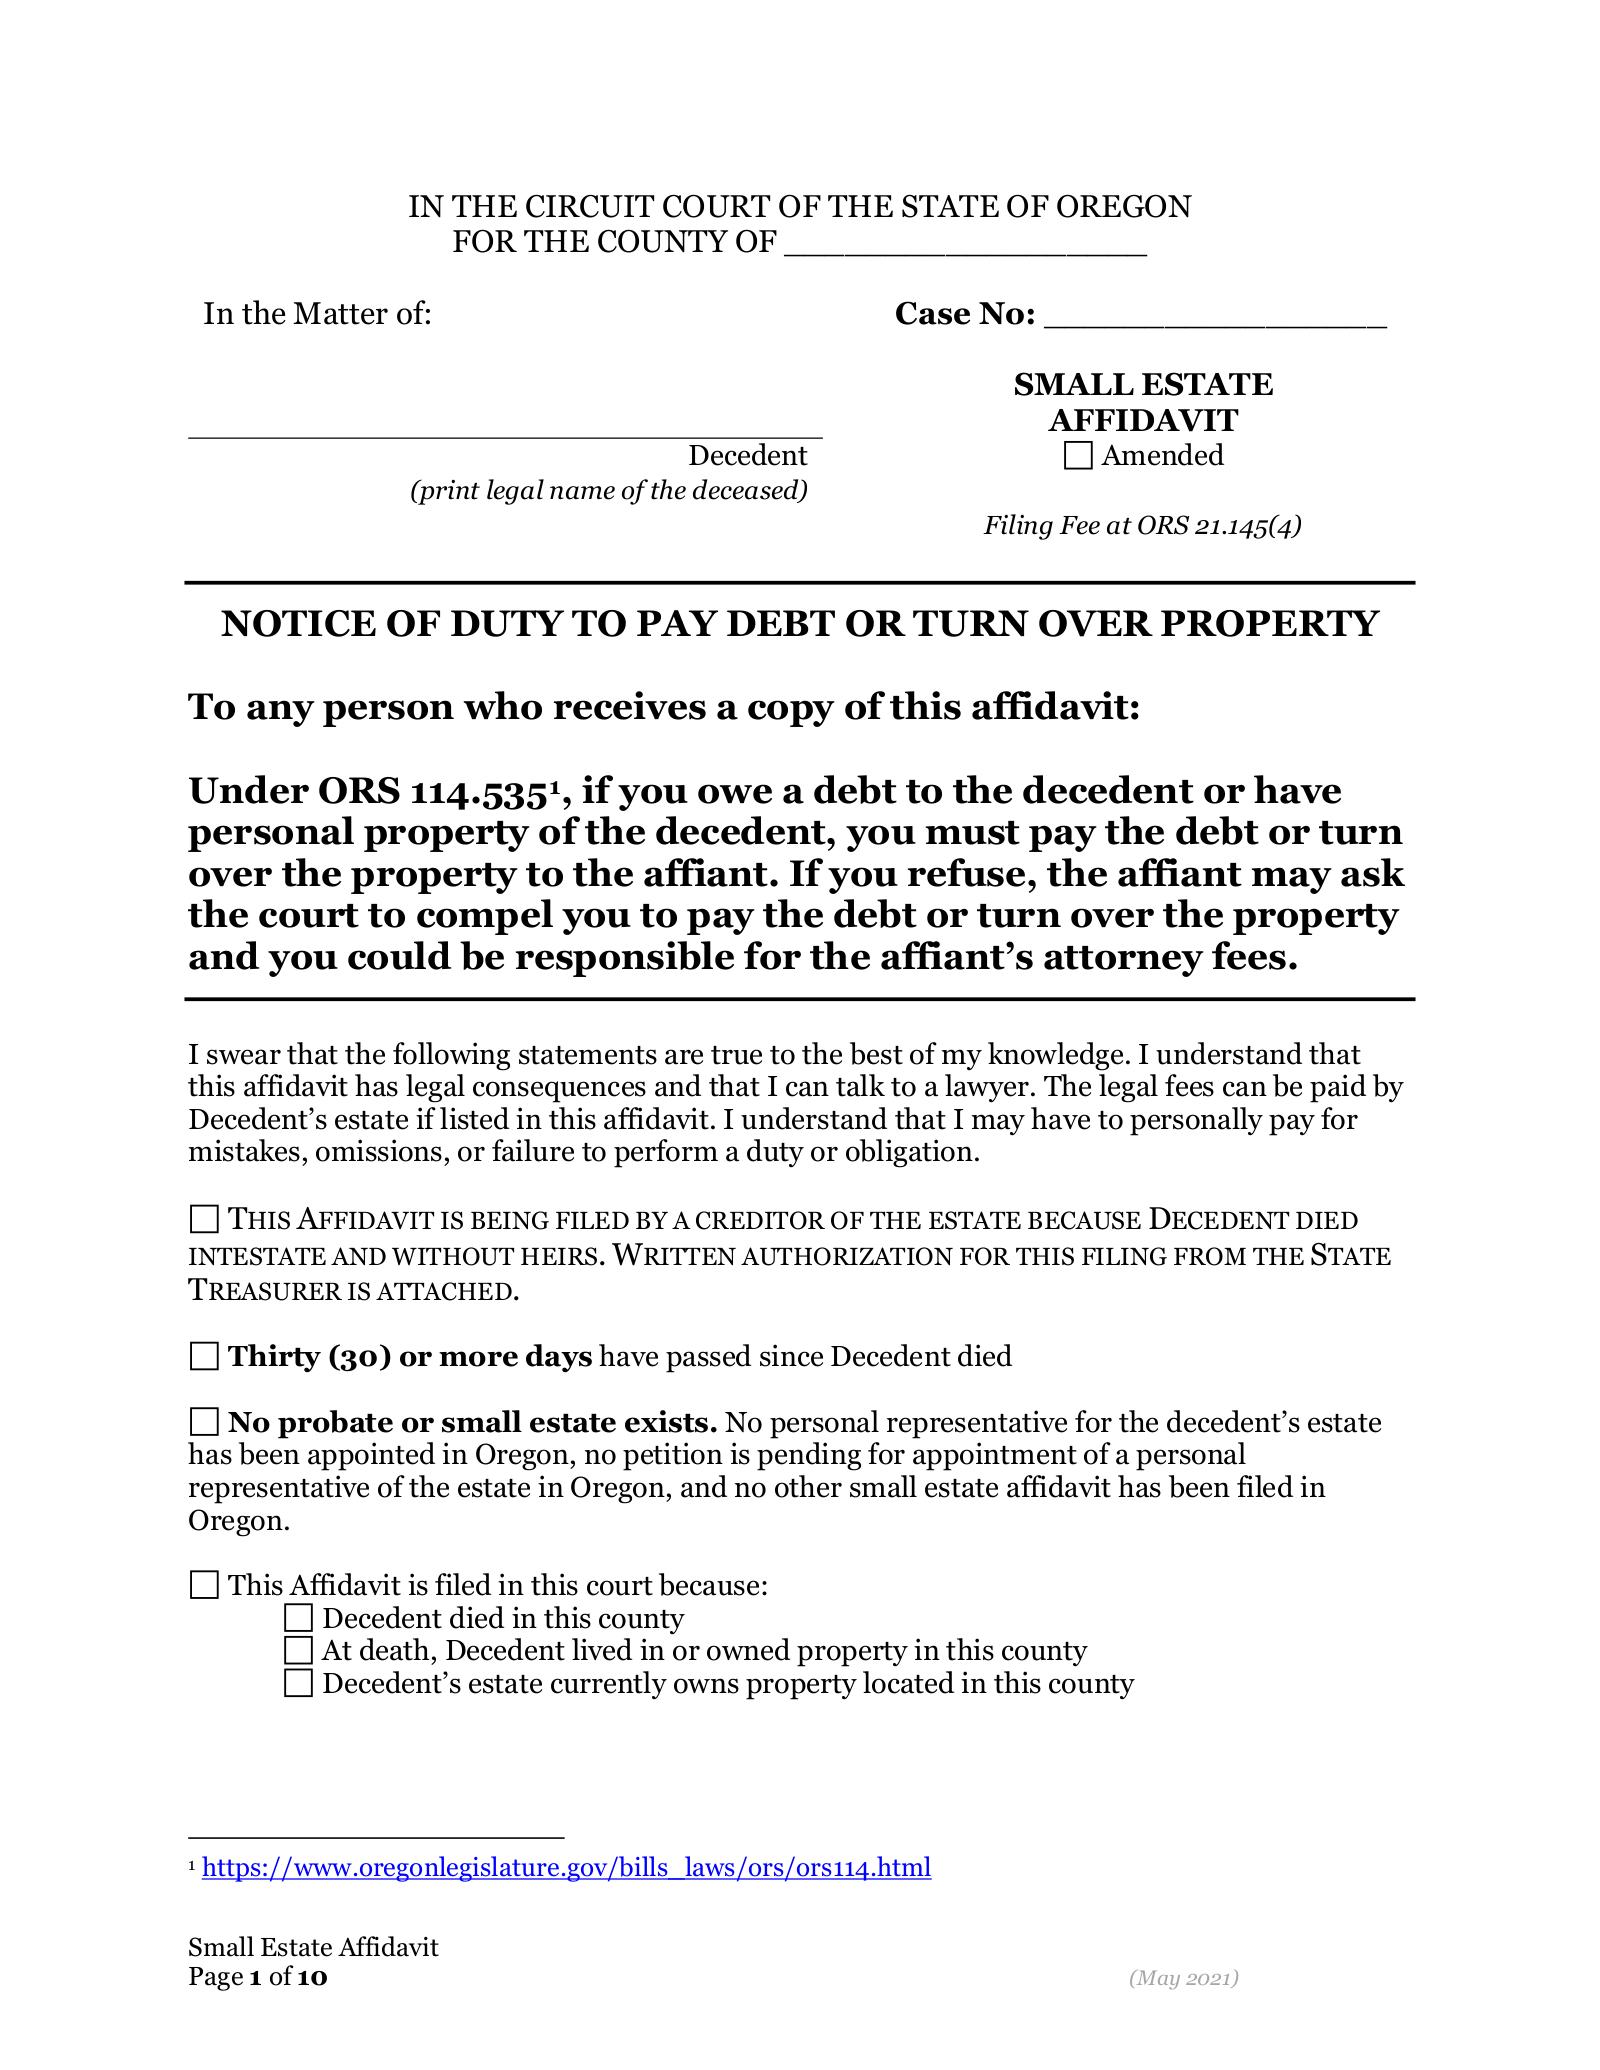 Free Oregon Small Estate Affidavit